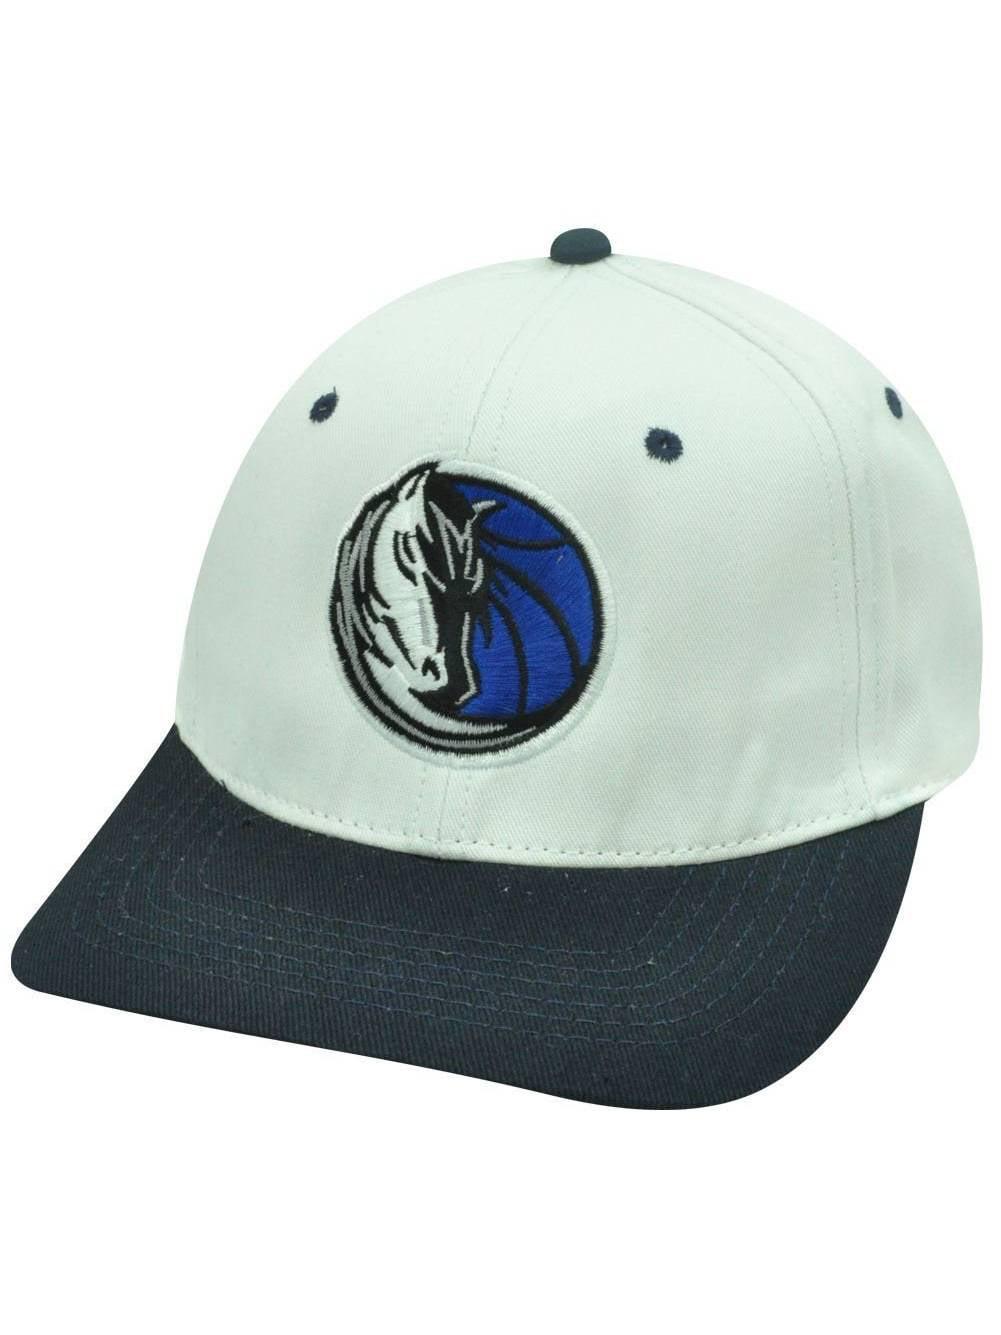 59a9b86b90e NBA Dallas Mavericks Flat Bill Snapback Licensed Adidas Hat Cap ...